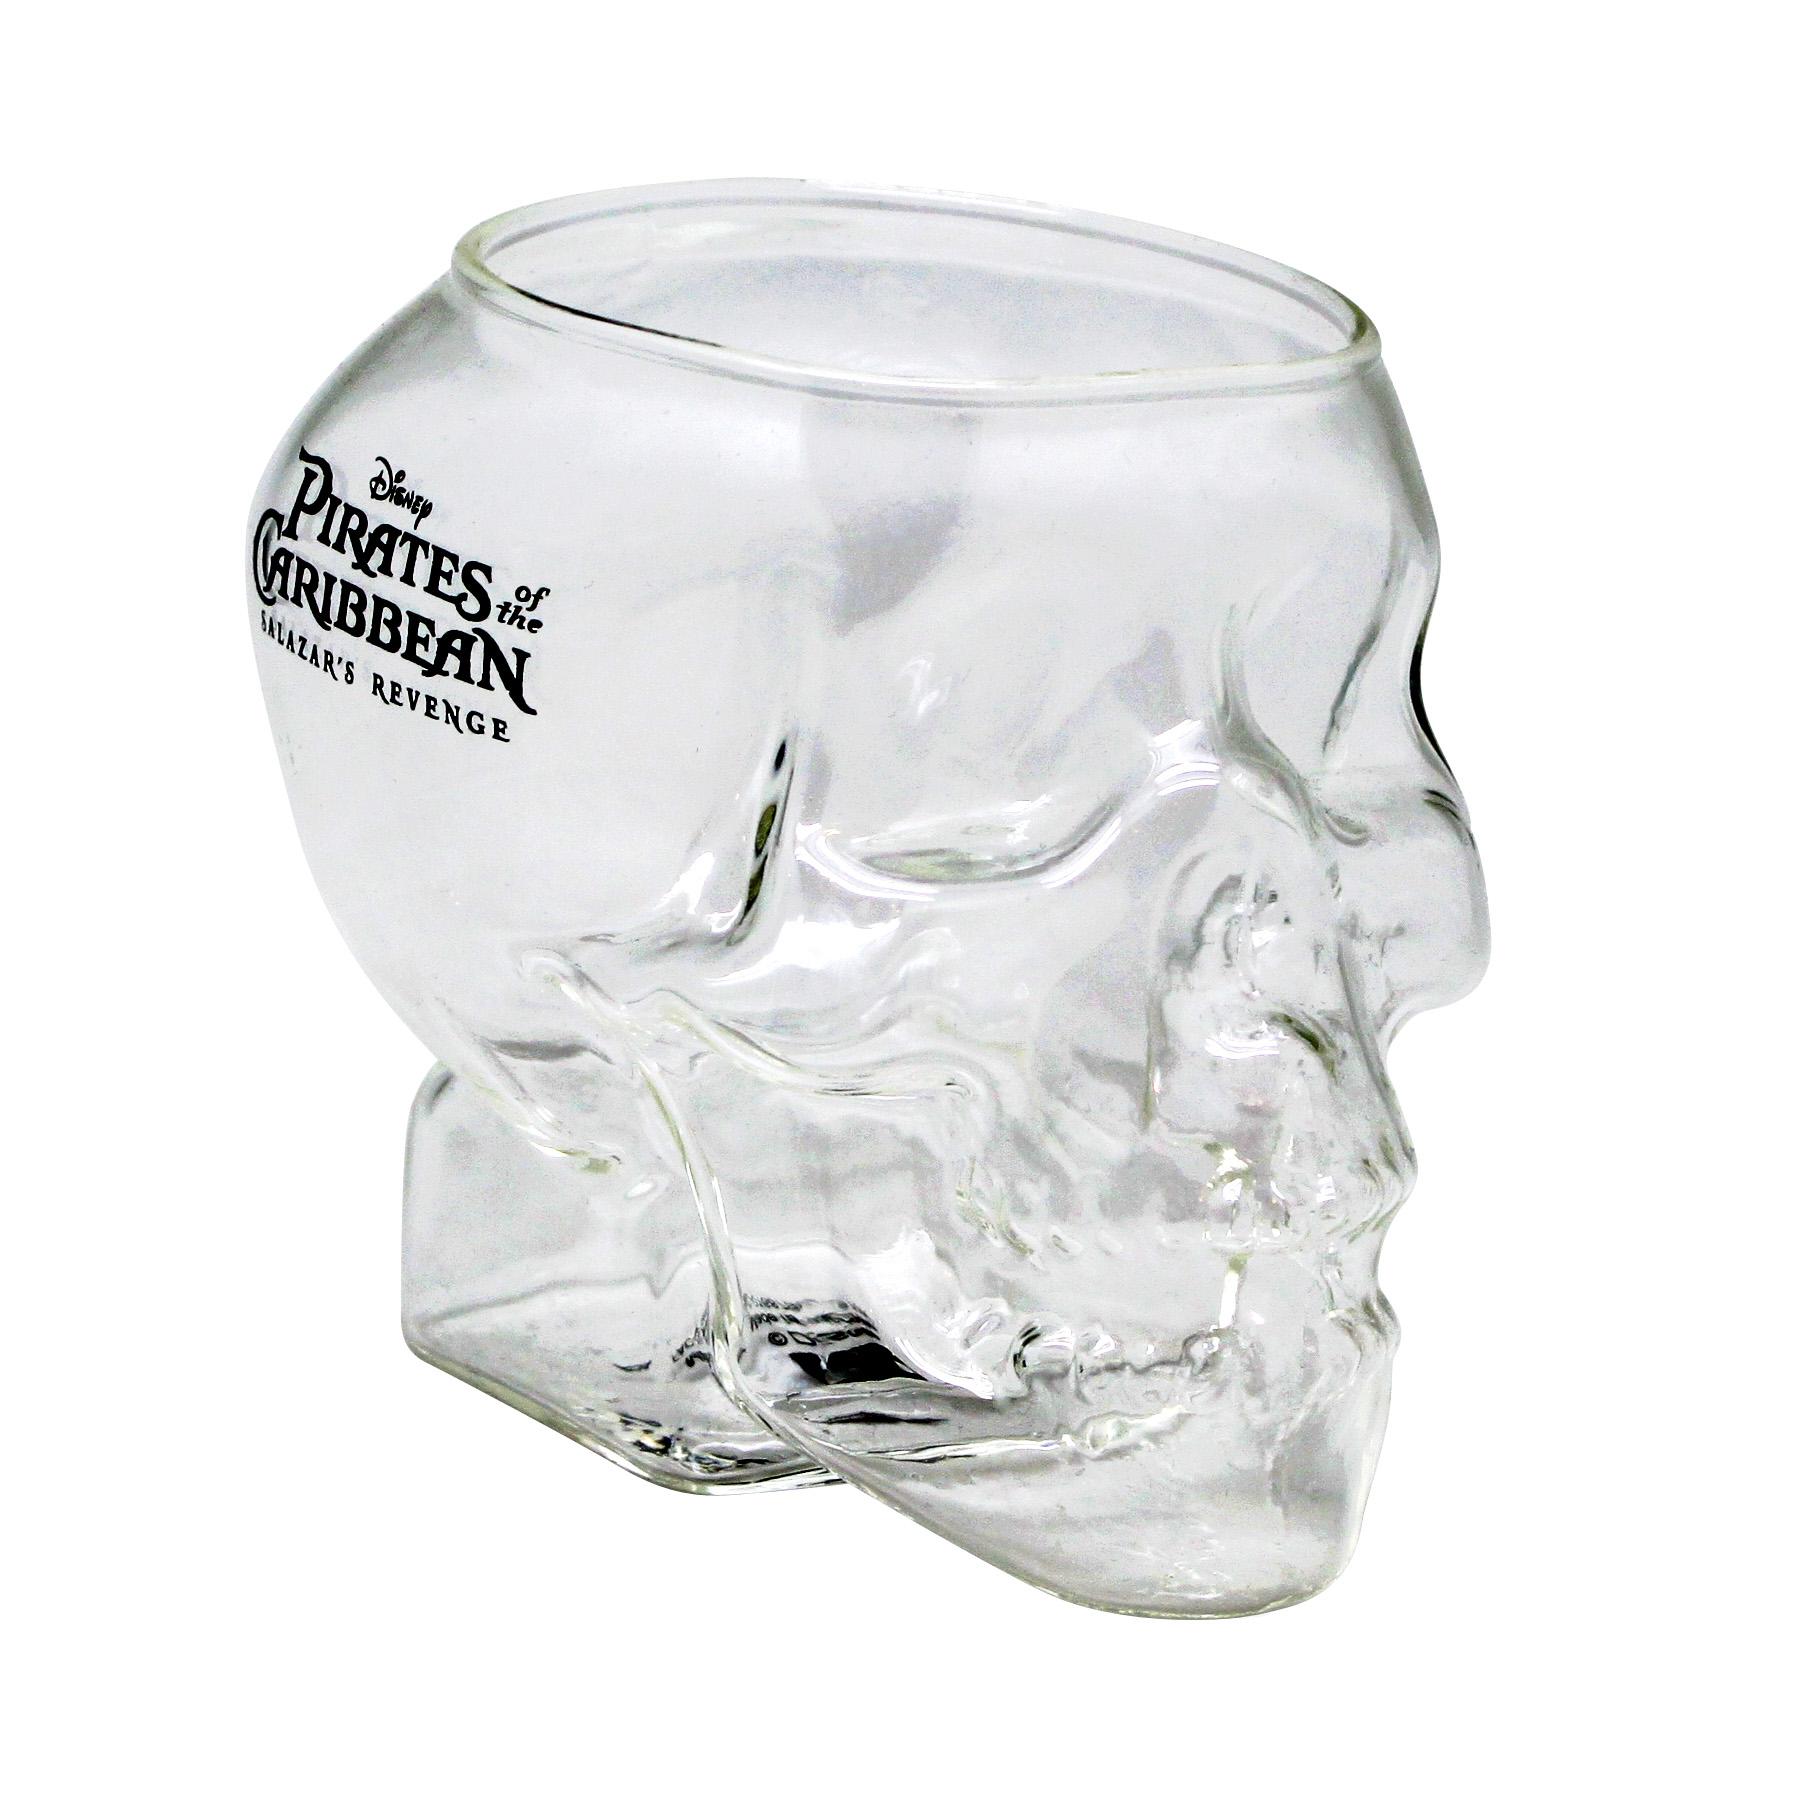 POTC5-SR_Skull Glass_P.jpg (1809×1809)